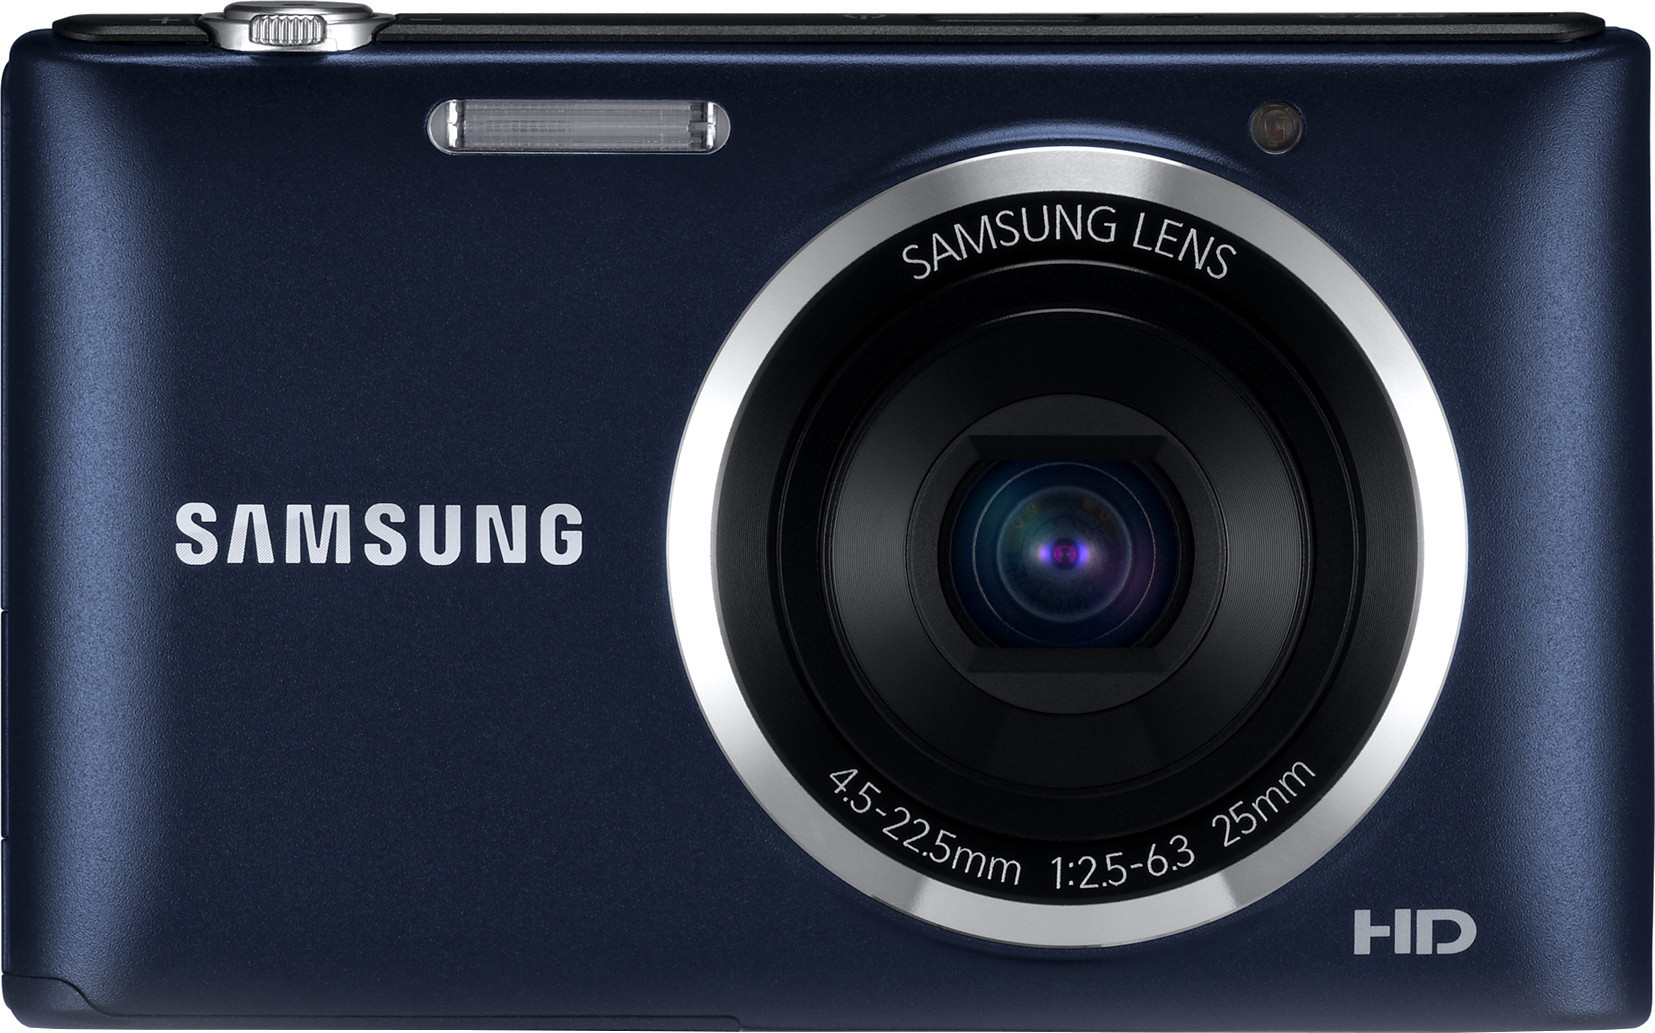 SAMSUNG ST72 Point & Shoot Camera(Black)